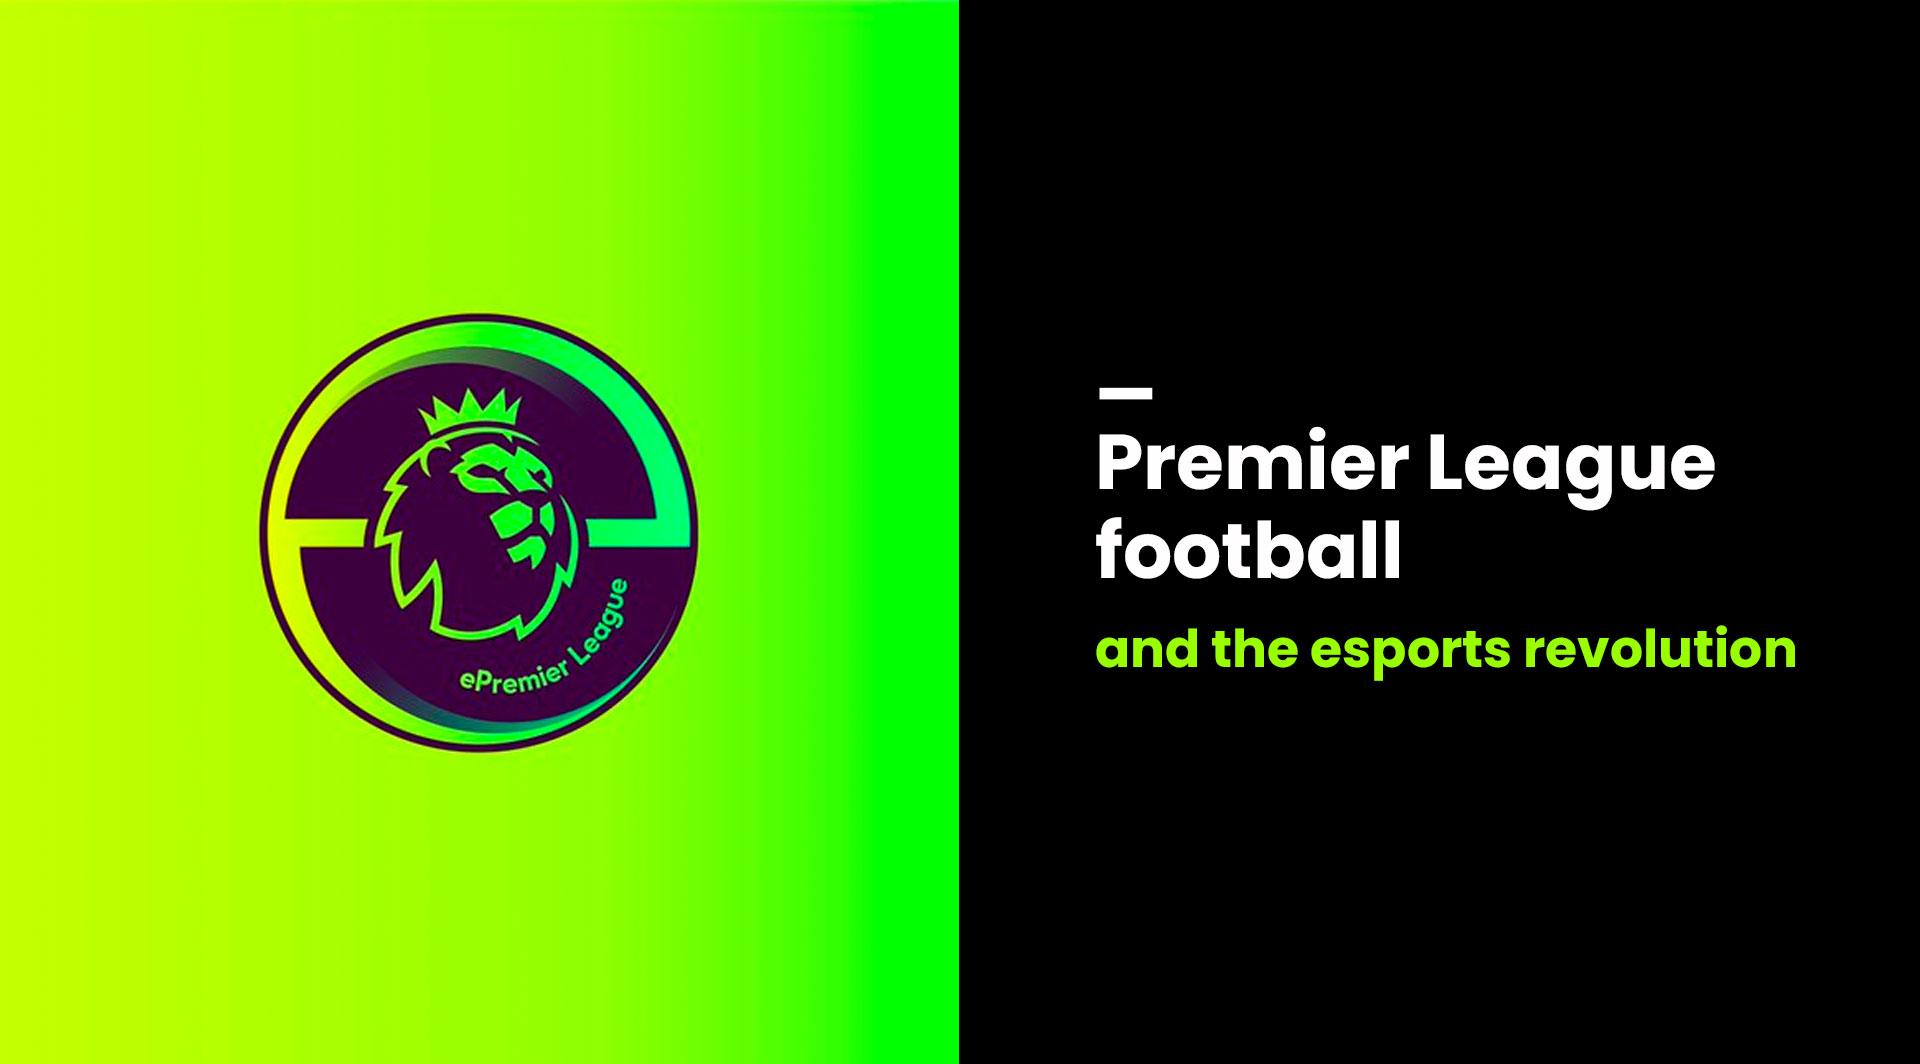 Premier League football esports revolution